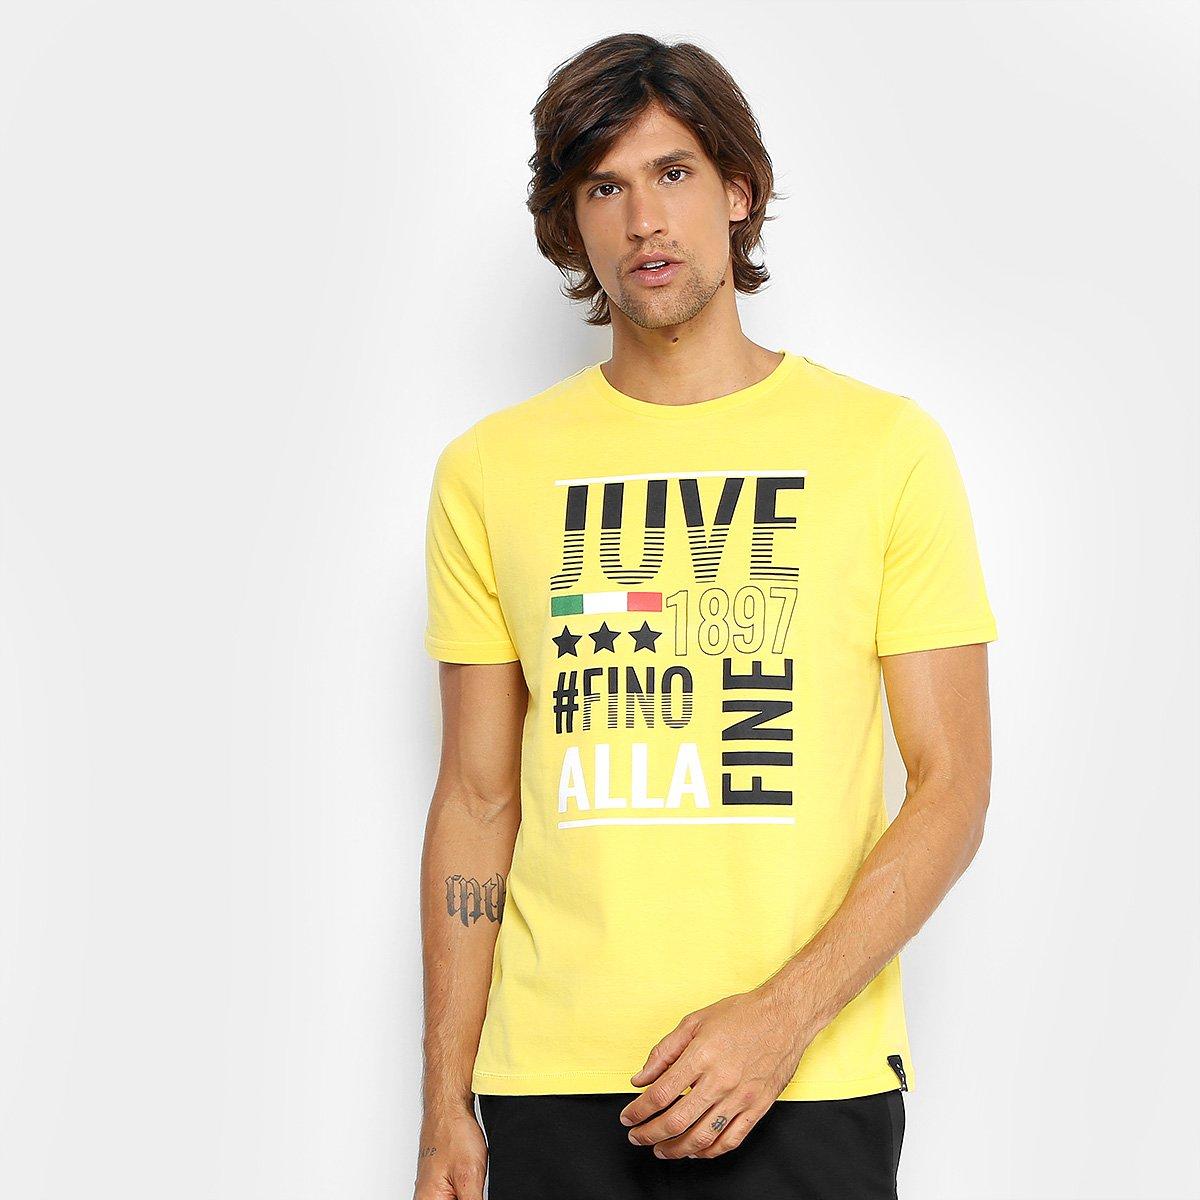 0438dcca1d566 Camiseta Juventus Fino Masculina